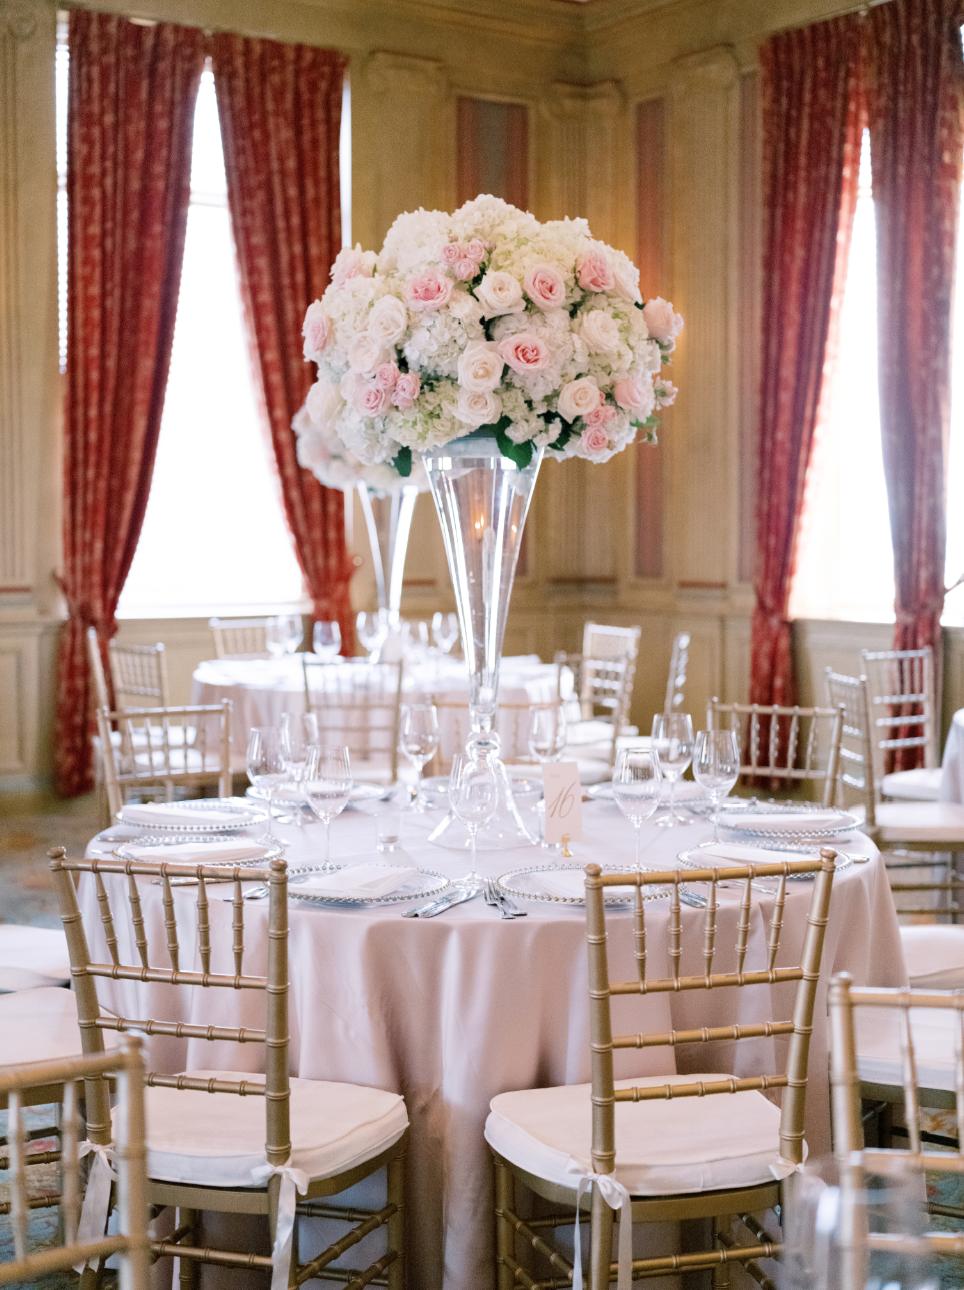 classic ballroom white and pink wedding flowers